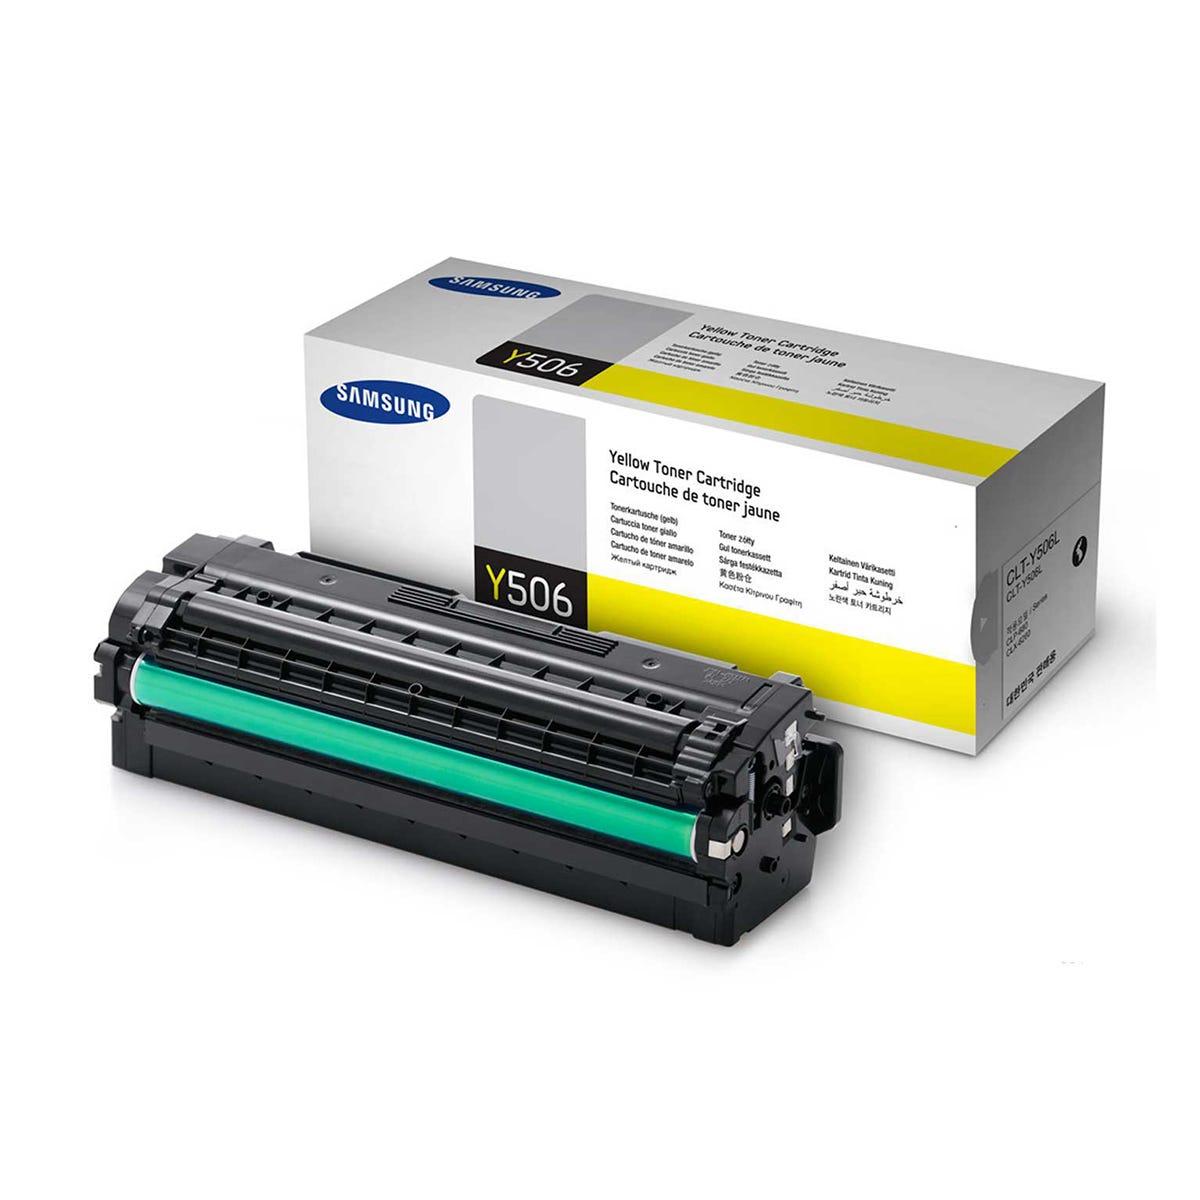 Samsung CLT-506L Inkjet Toner Cartridge, Yellow